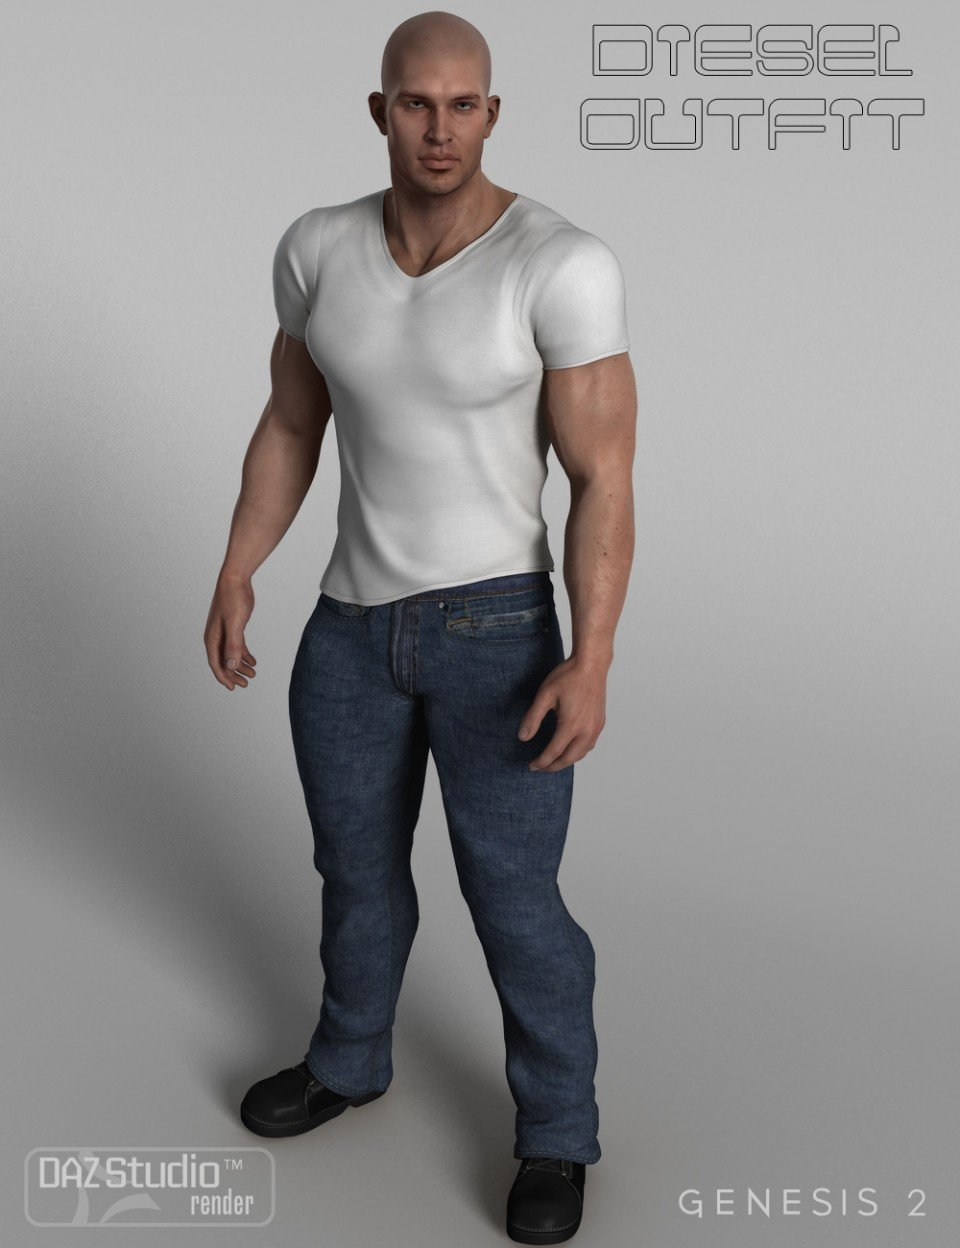 Diesel Outfit for Genesis 2 Male(s)_DAZ3D下载站